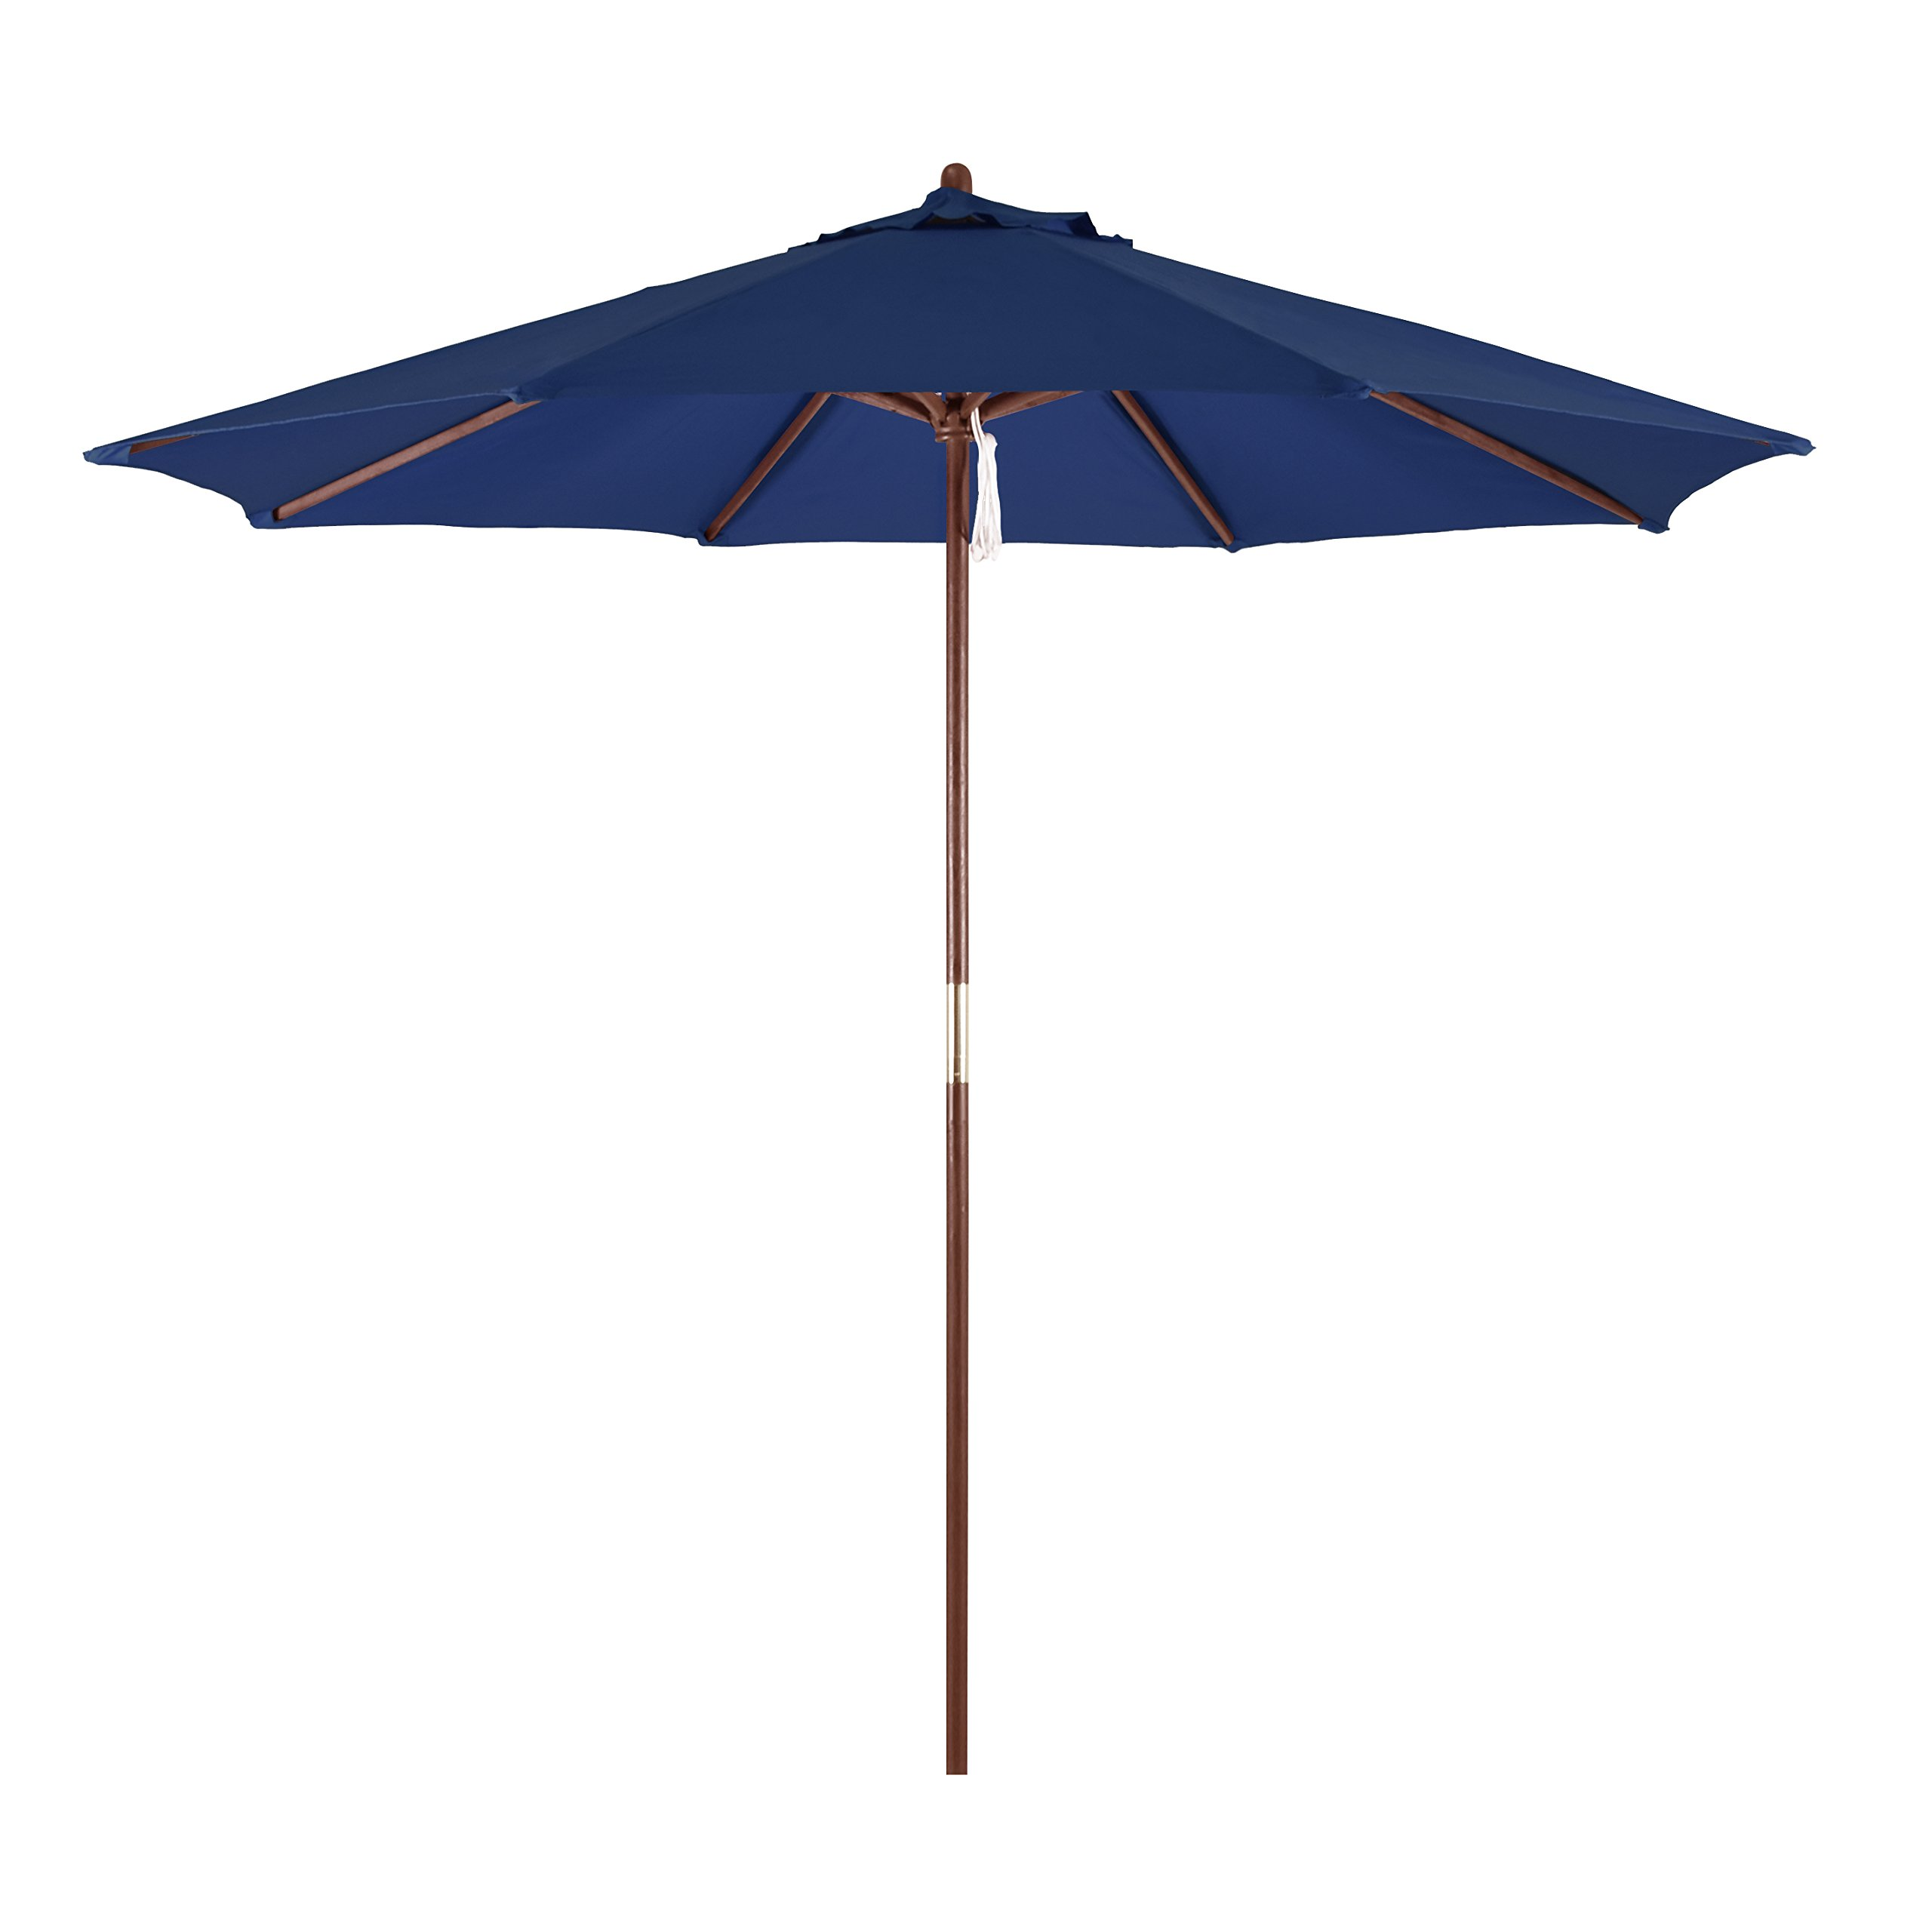 California Umbrella 9' Round Hardwood Frame Market Umbrella, Pulley Lift, Polyester Navy Blue